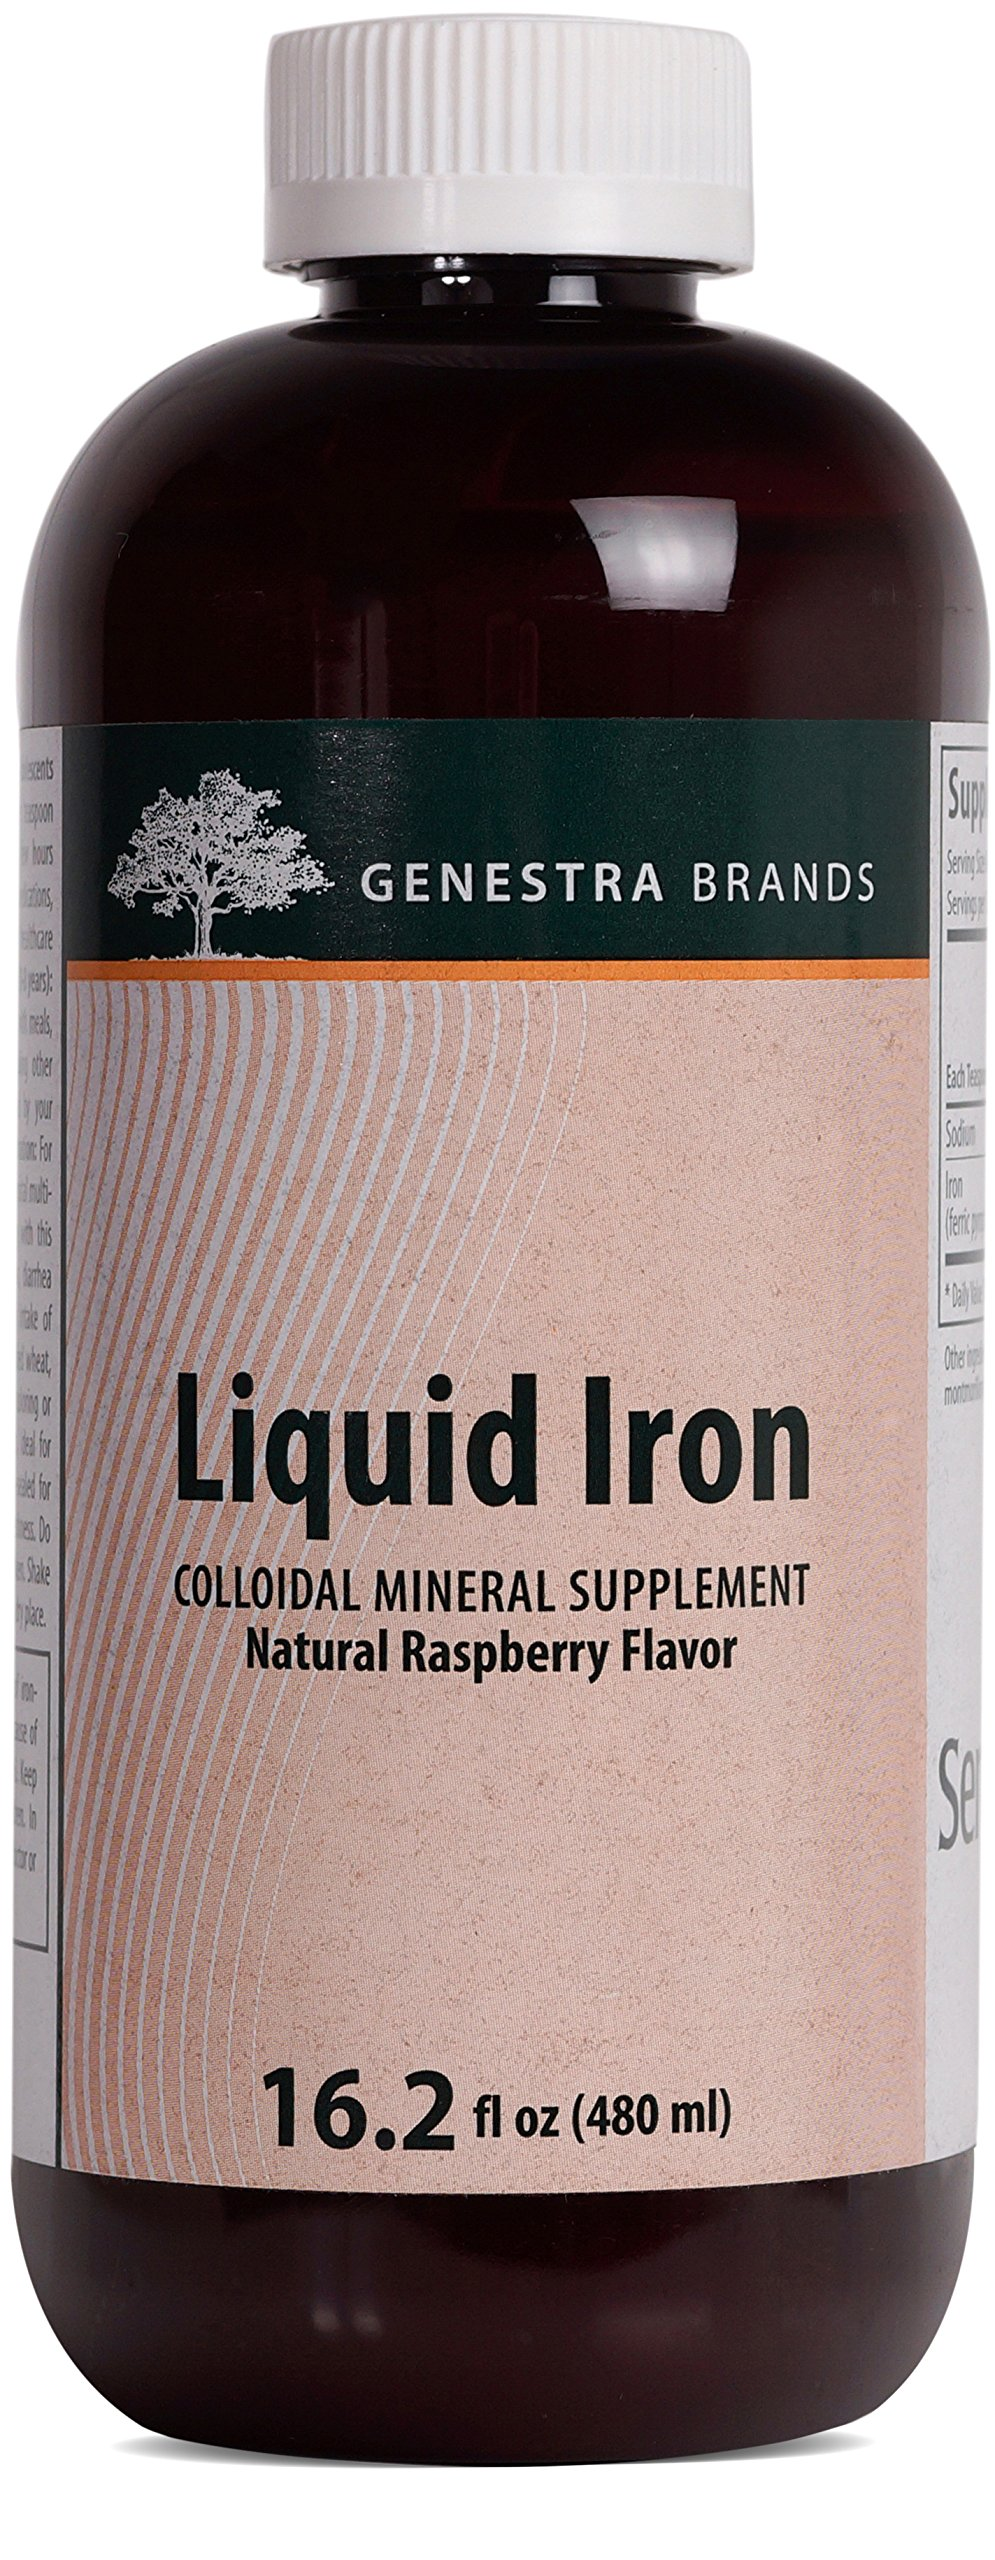 Genestra Brands - Liquid Iron - Colloidal Mineral Supplement - Natural Raspberry Flavor - 16.2 fl oz (480 ml)